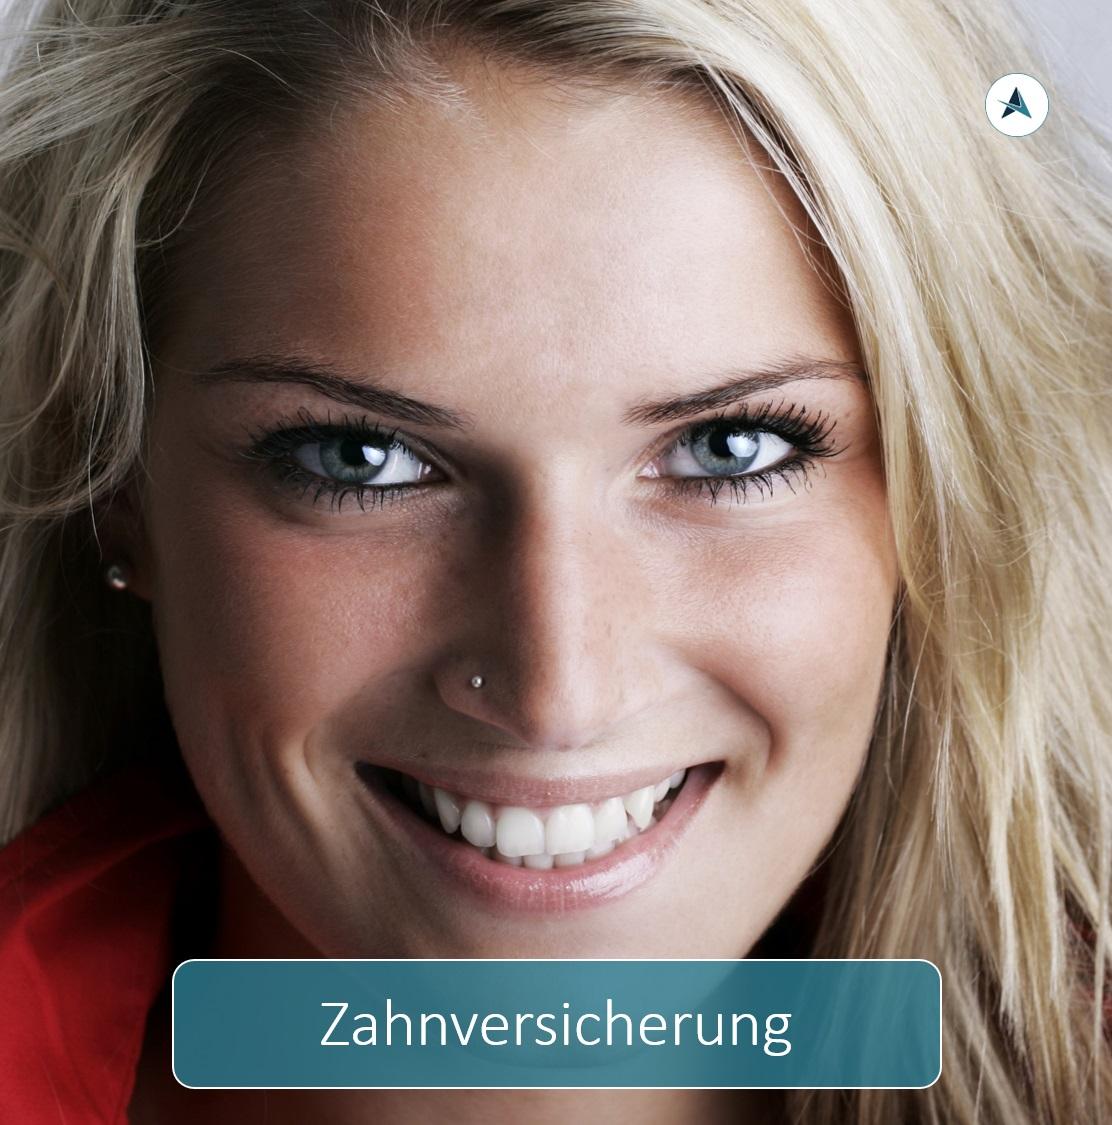 Versicherungsmakler-Berlin-Kaulsdorf-Zahnversicherung-Zahnzusatzversicherung-André-Böttcher-12621